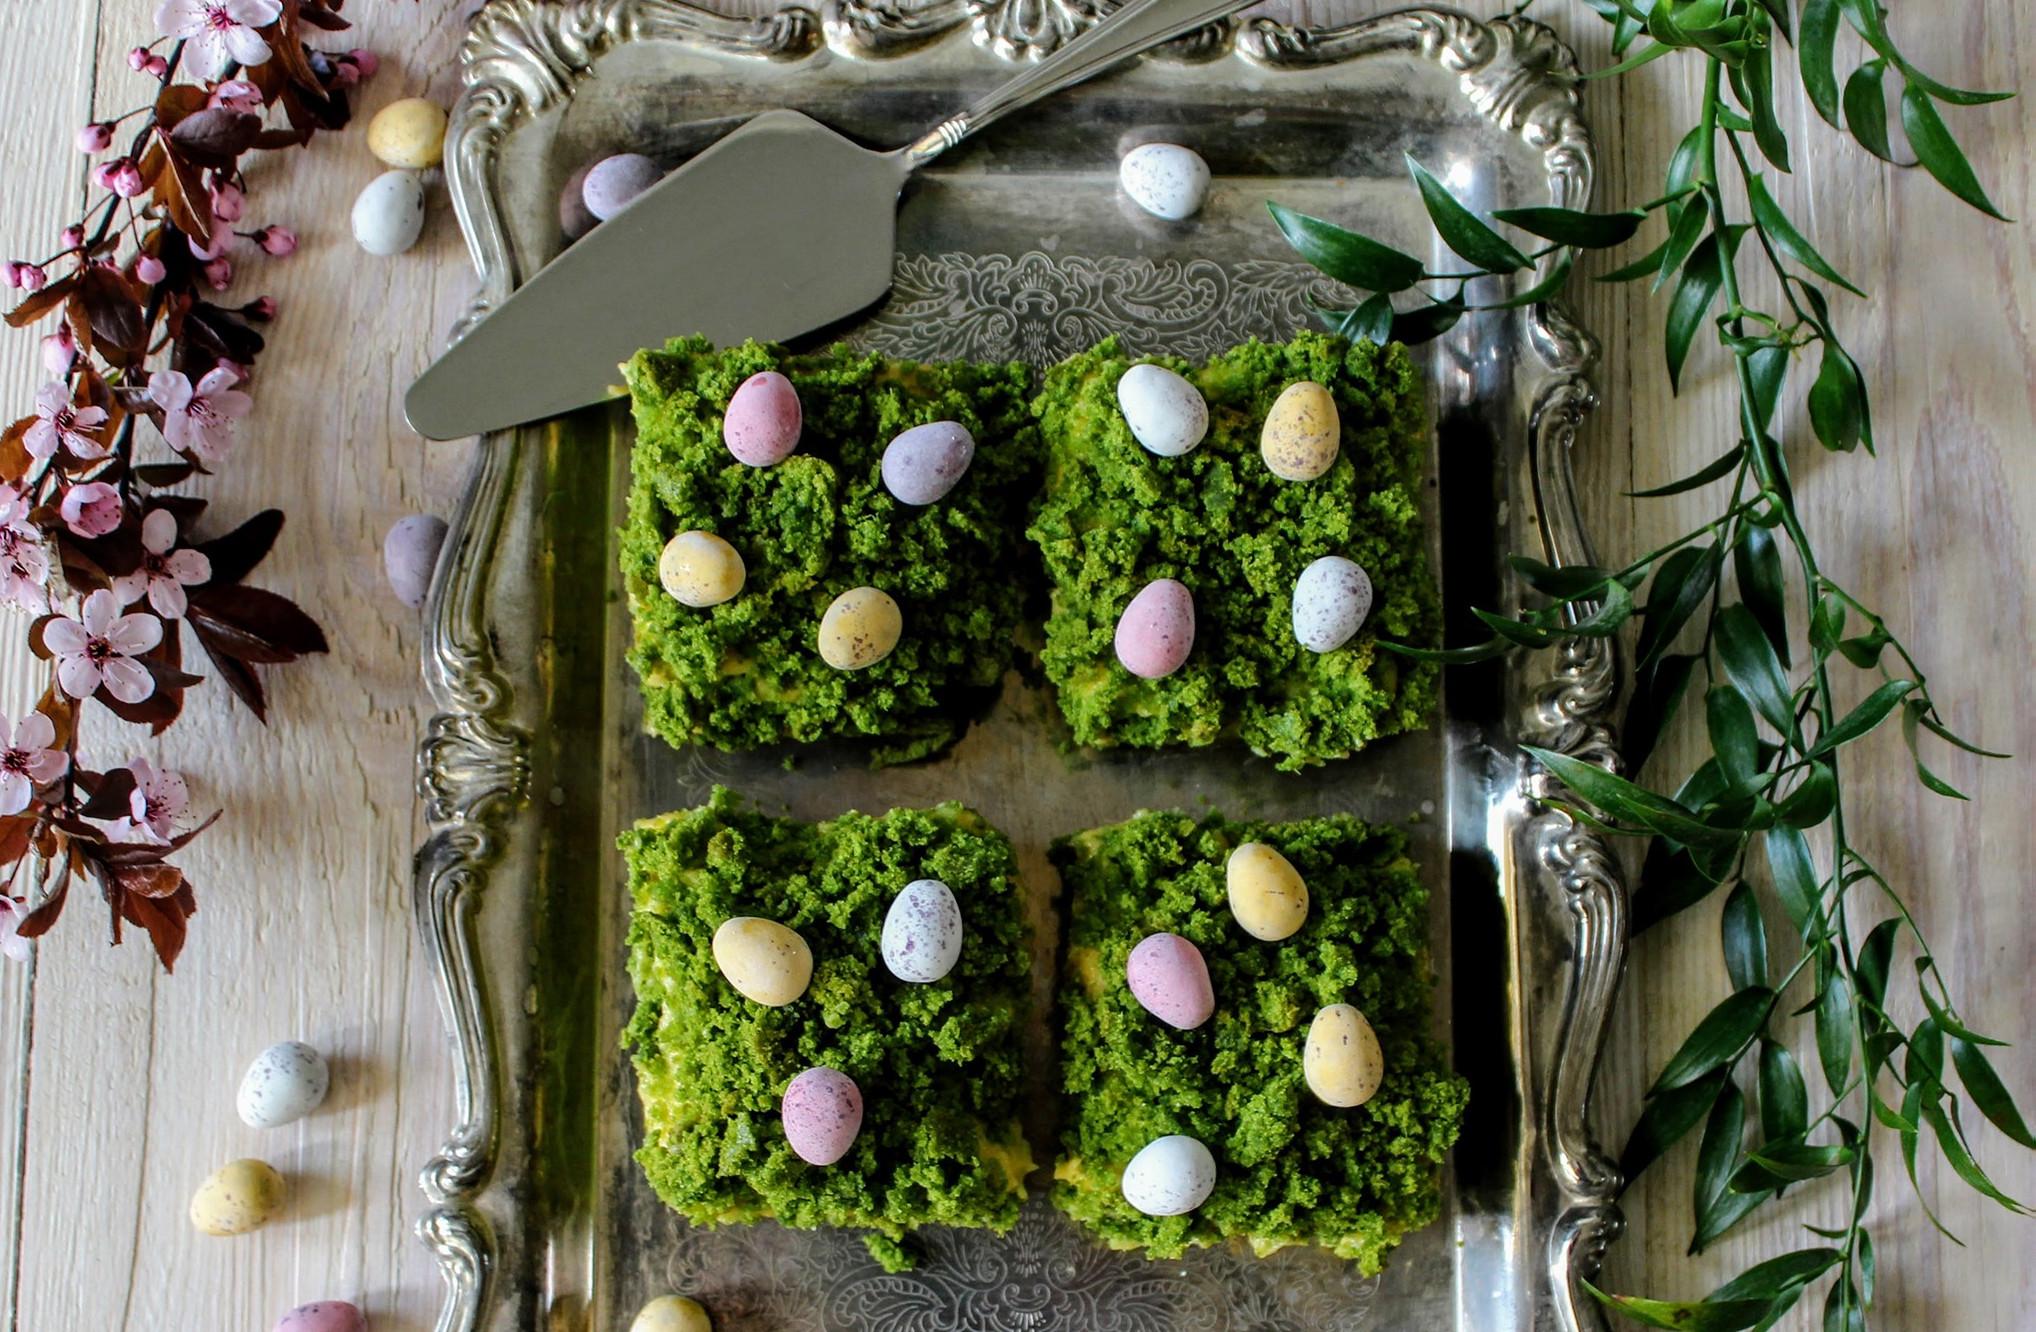 Mech na Wielkanoc